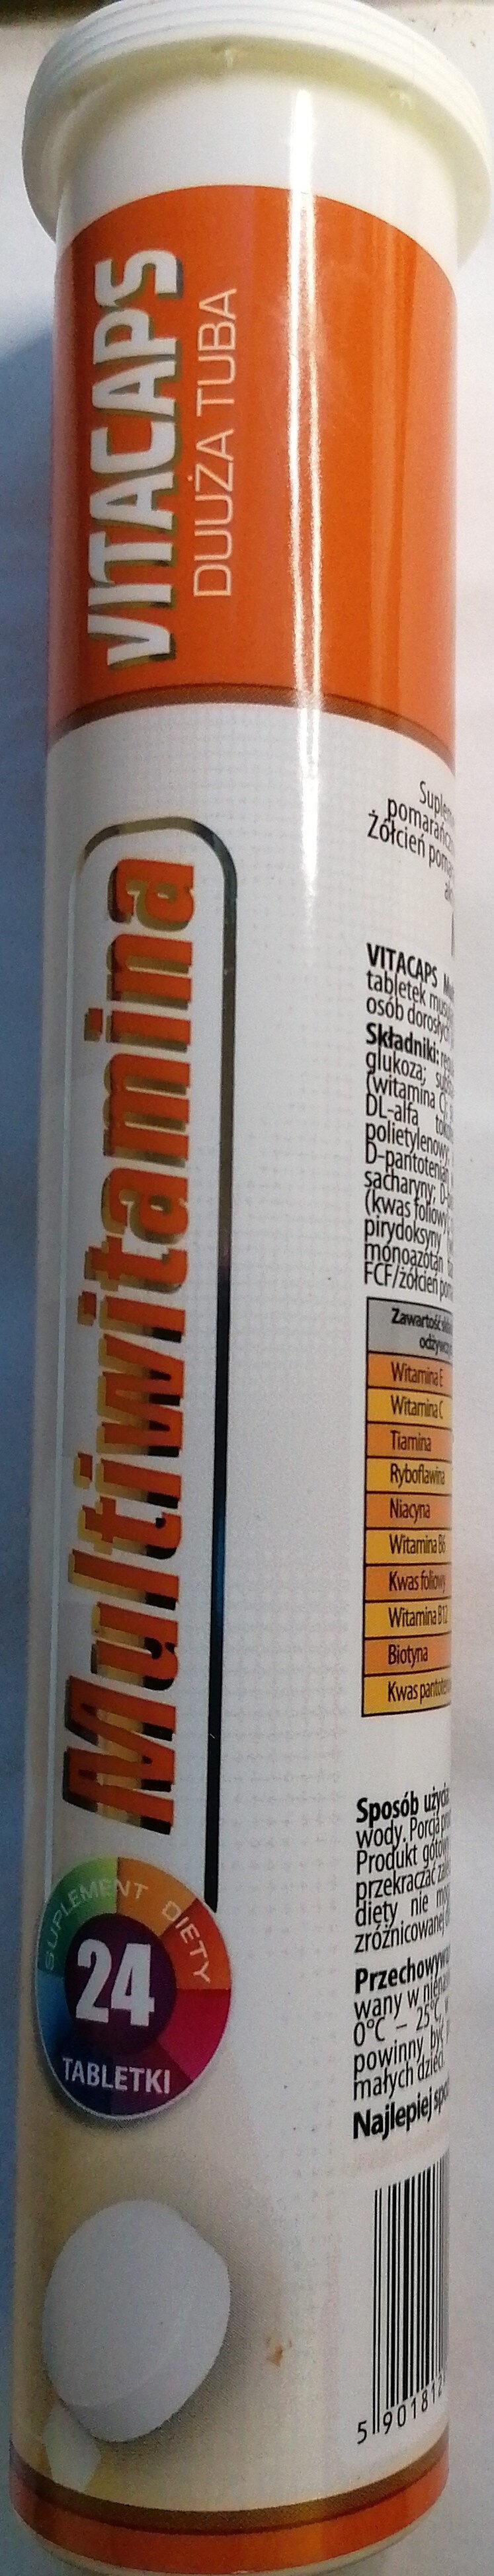 Vitacaps Multivitamina - Produkt - pl